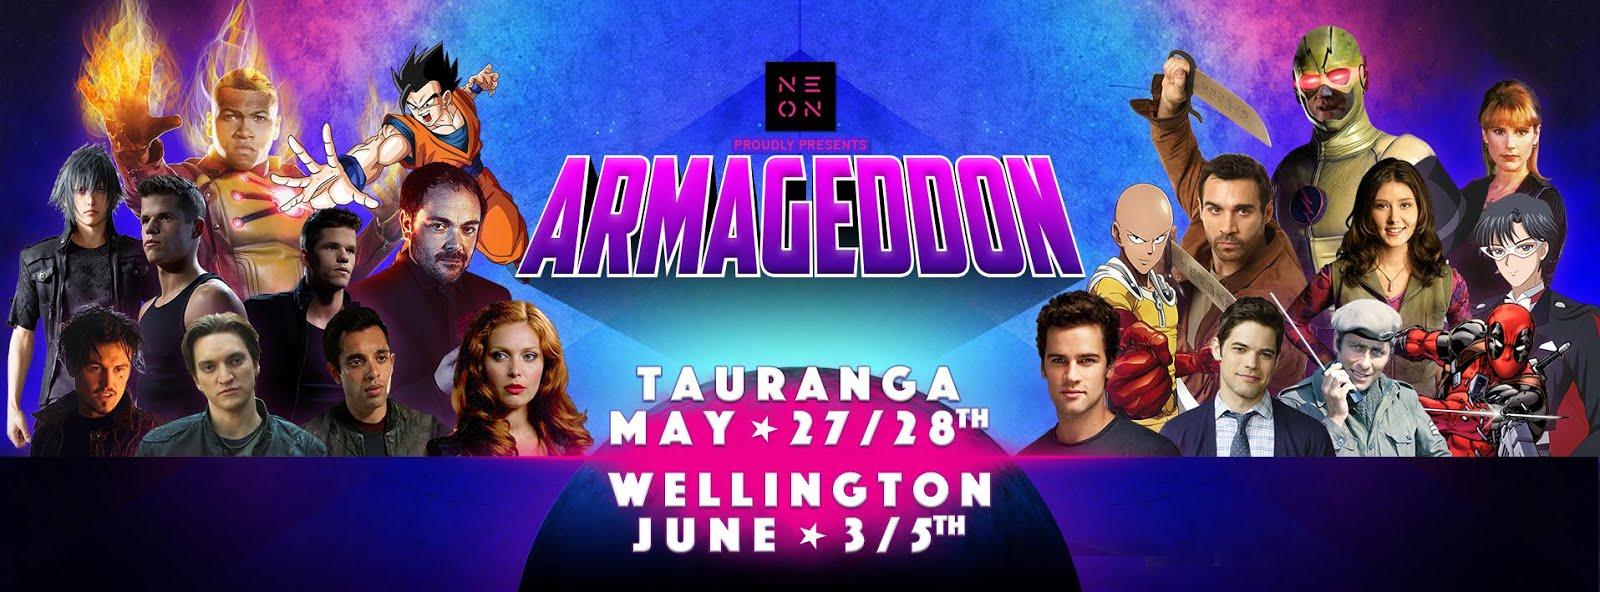 Australia June 3-5th